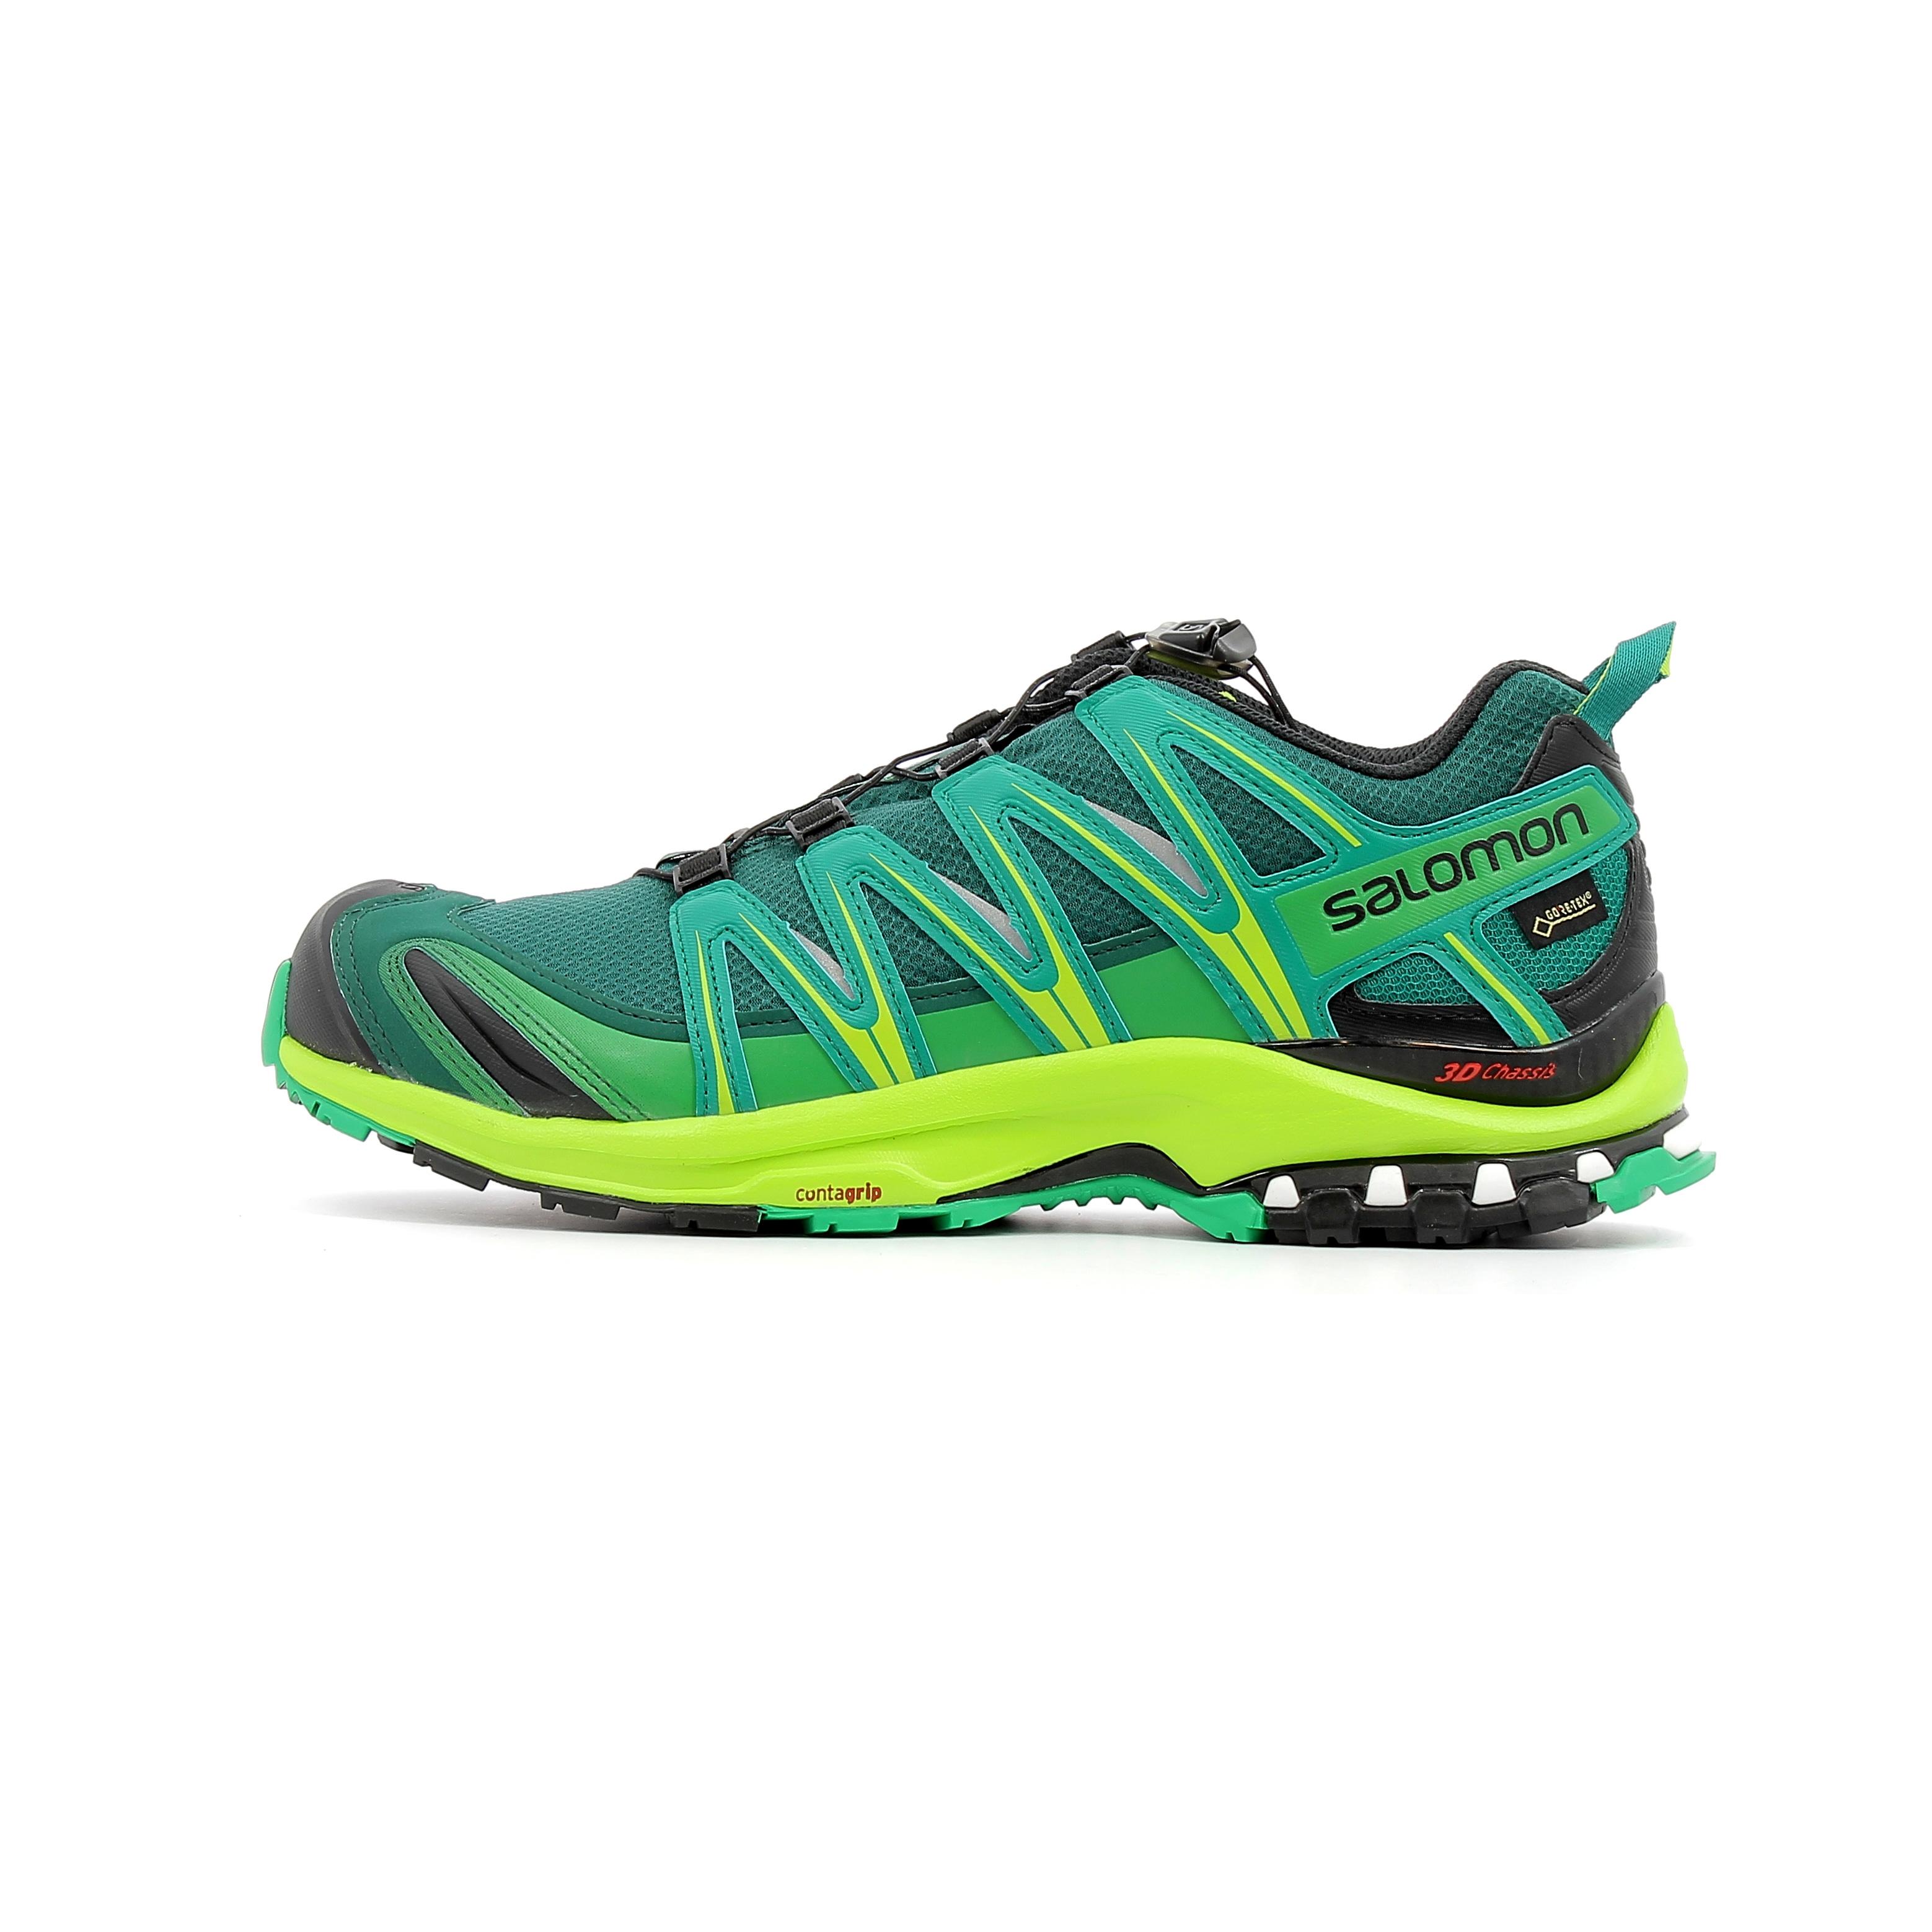 926880af3bda Chaussures de trail   rando Salomon XA Pro 3D GTX M